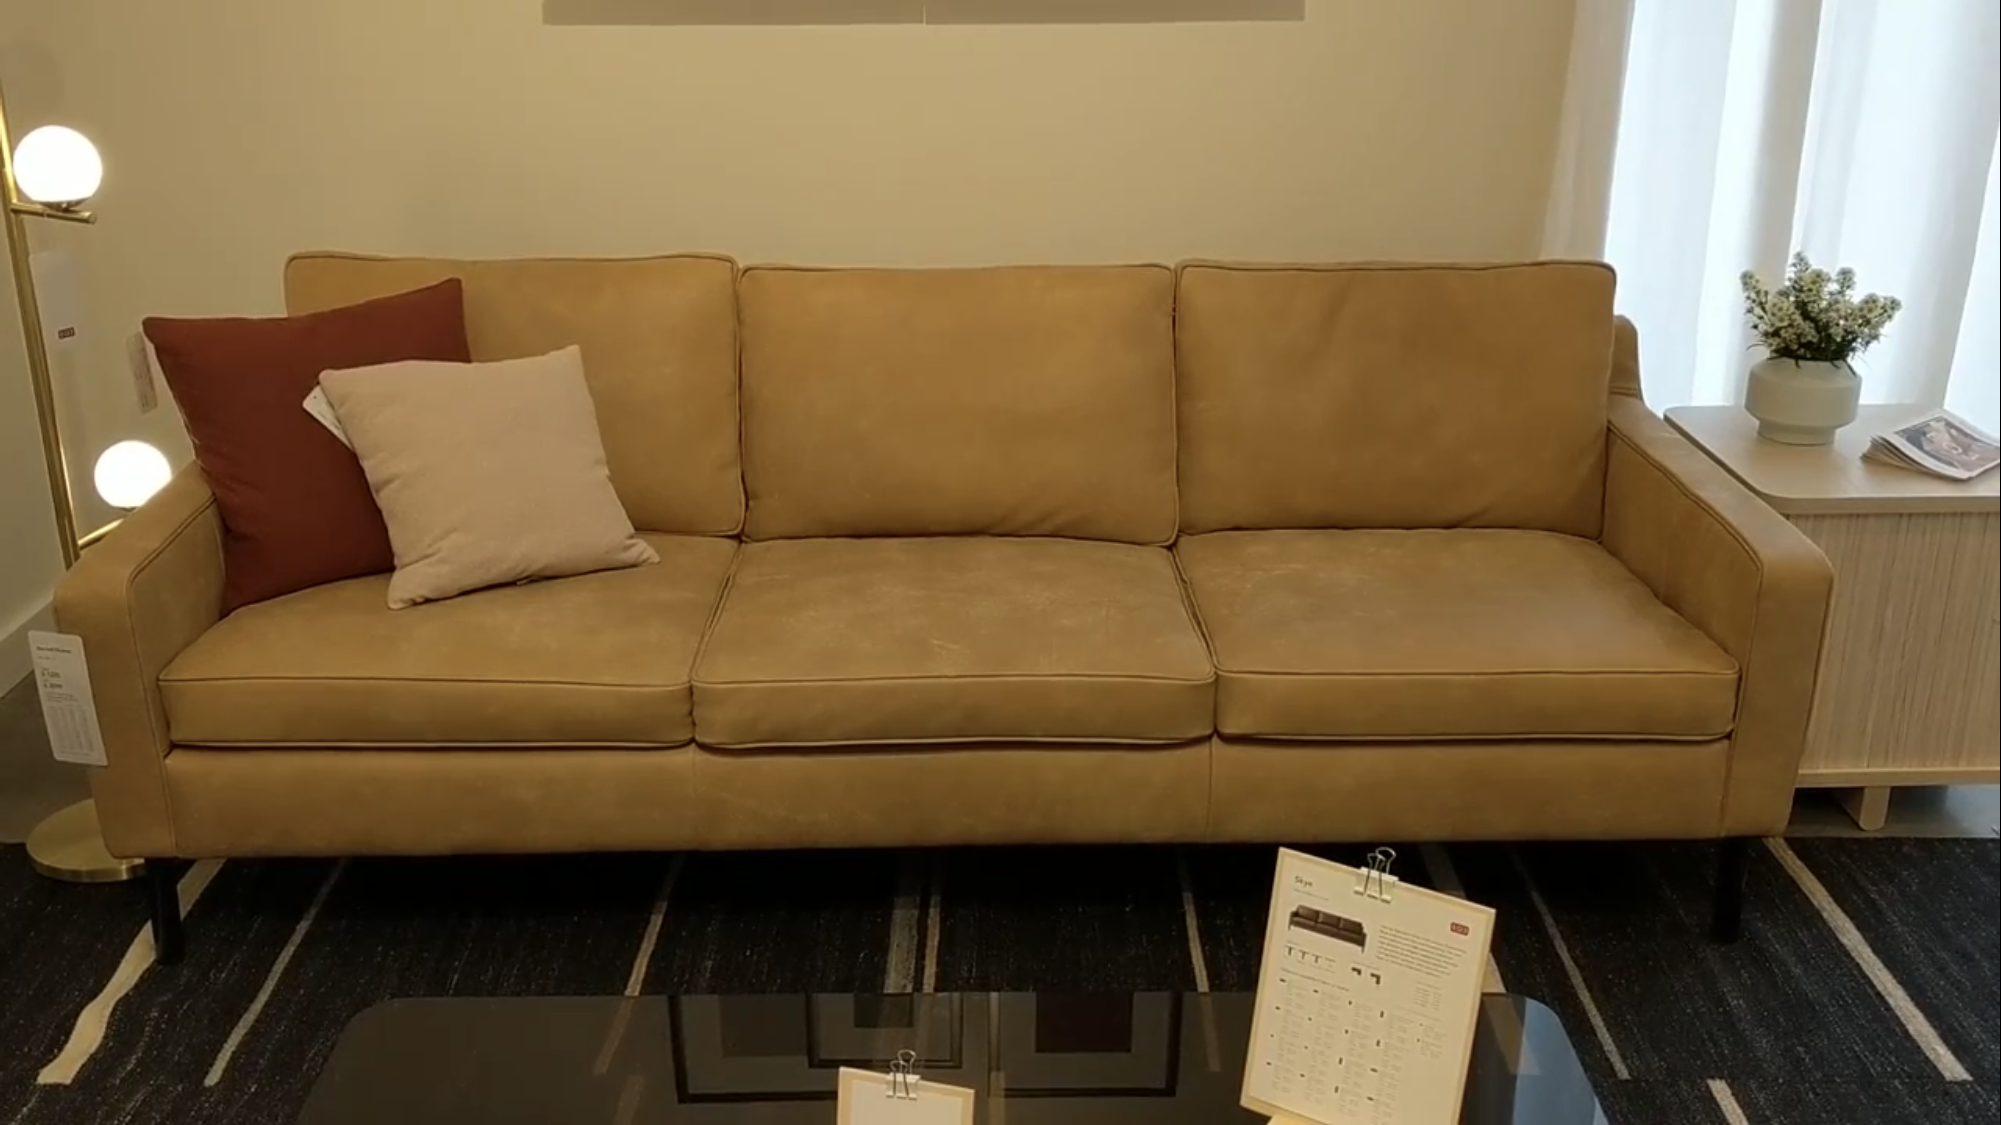 Eq3 Skye Sofa At Rubin S Furniture 1099 Starting In Fabric Contemporary Furniture Stores Furniture Contemporary Furniture